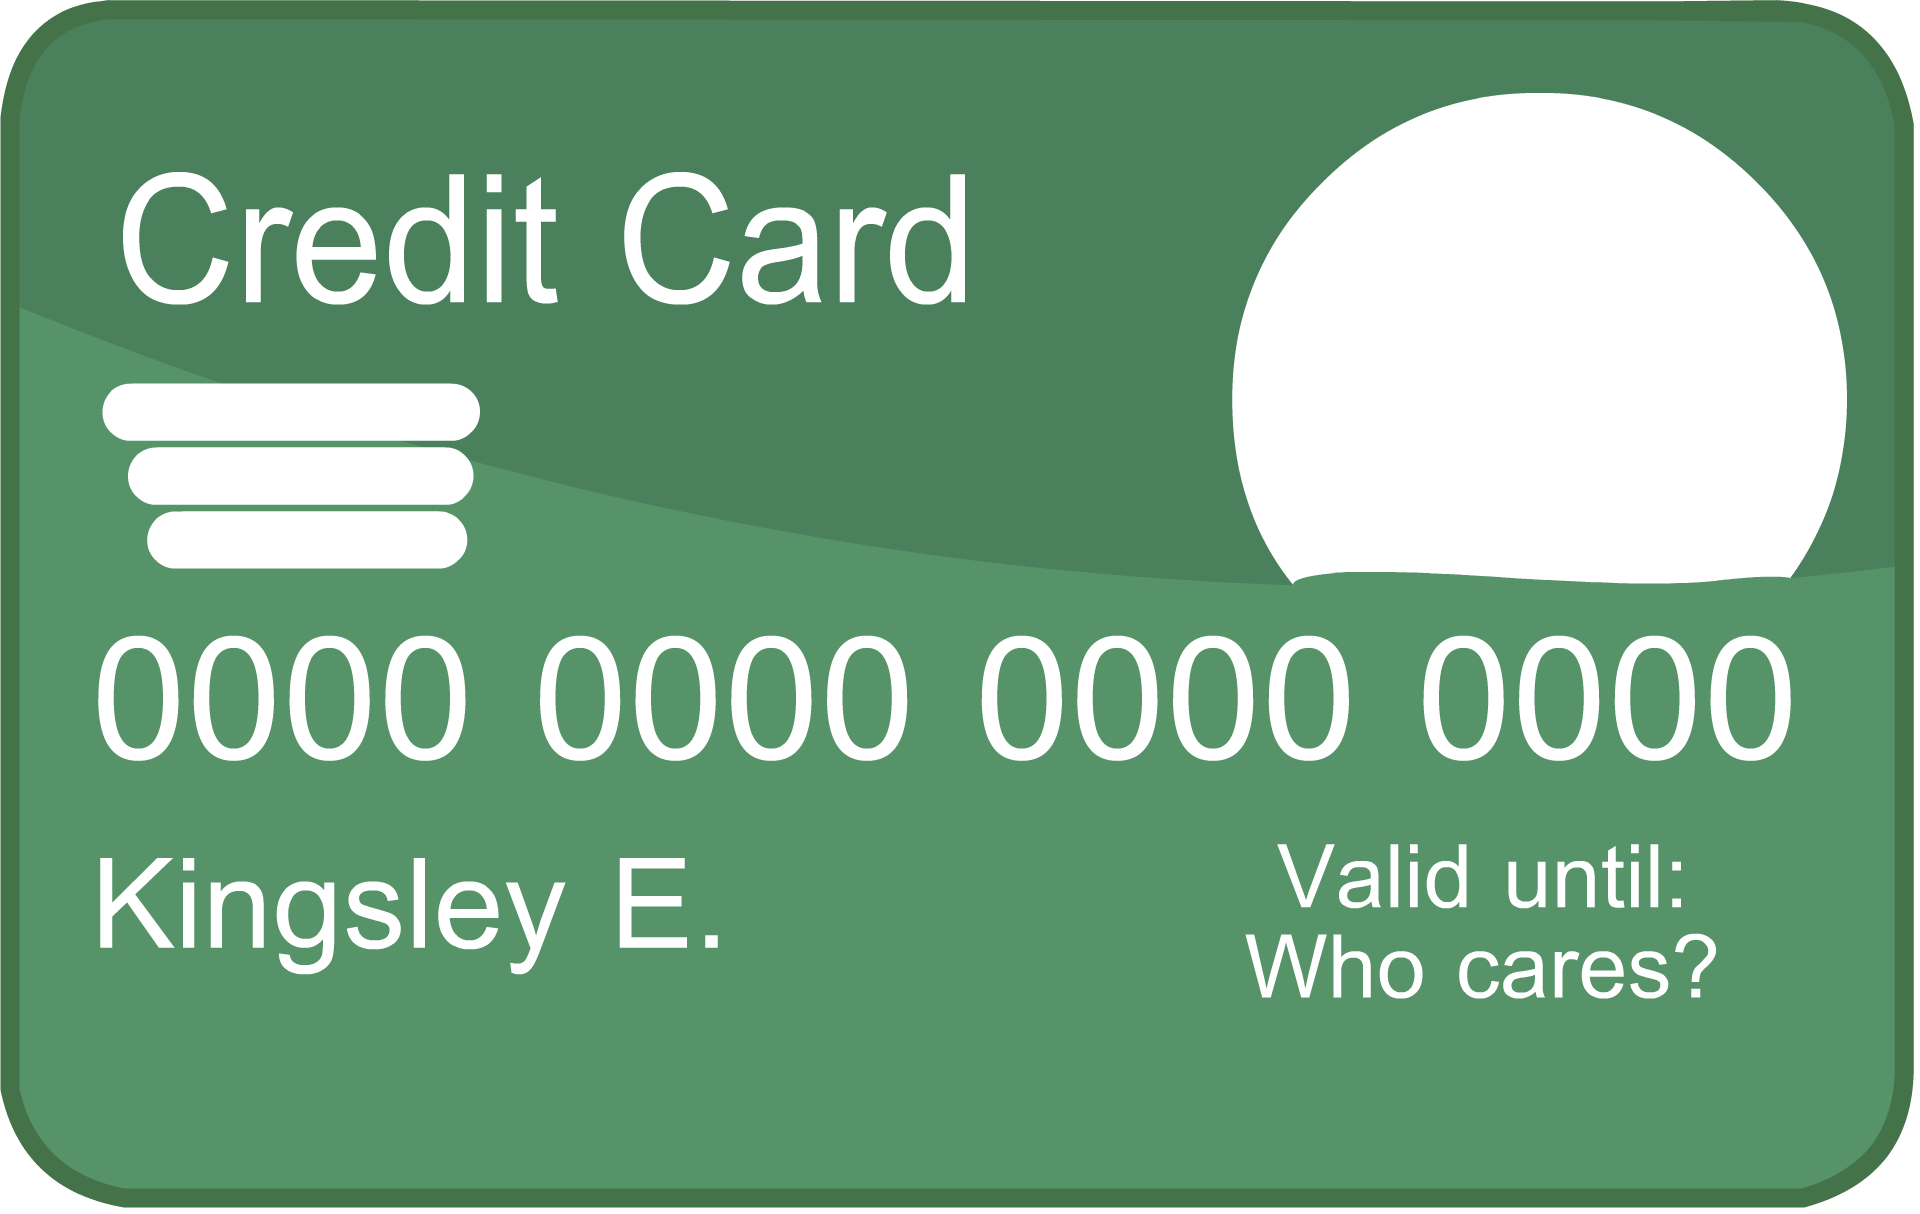 image credit card png object mayhem wiki fandom powered by wikia